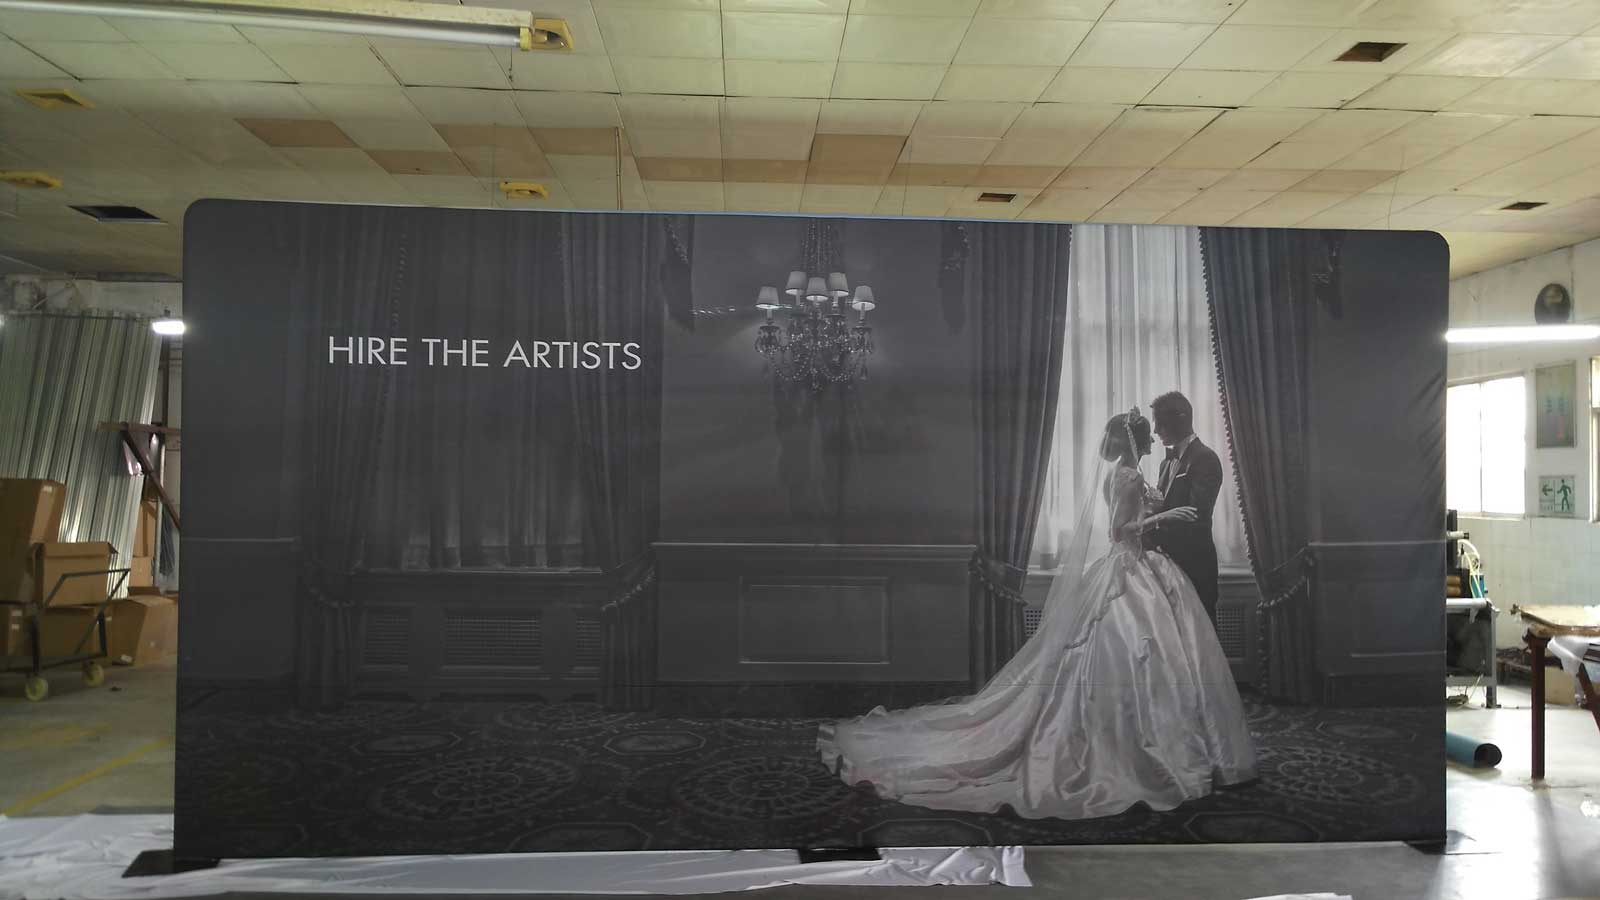 Wedding Logo Backdrop Walls 10 High X 20 Wide Tradeshow Display